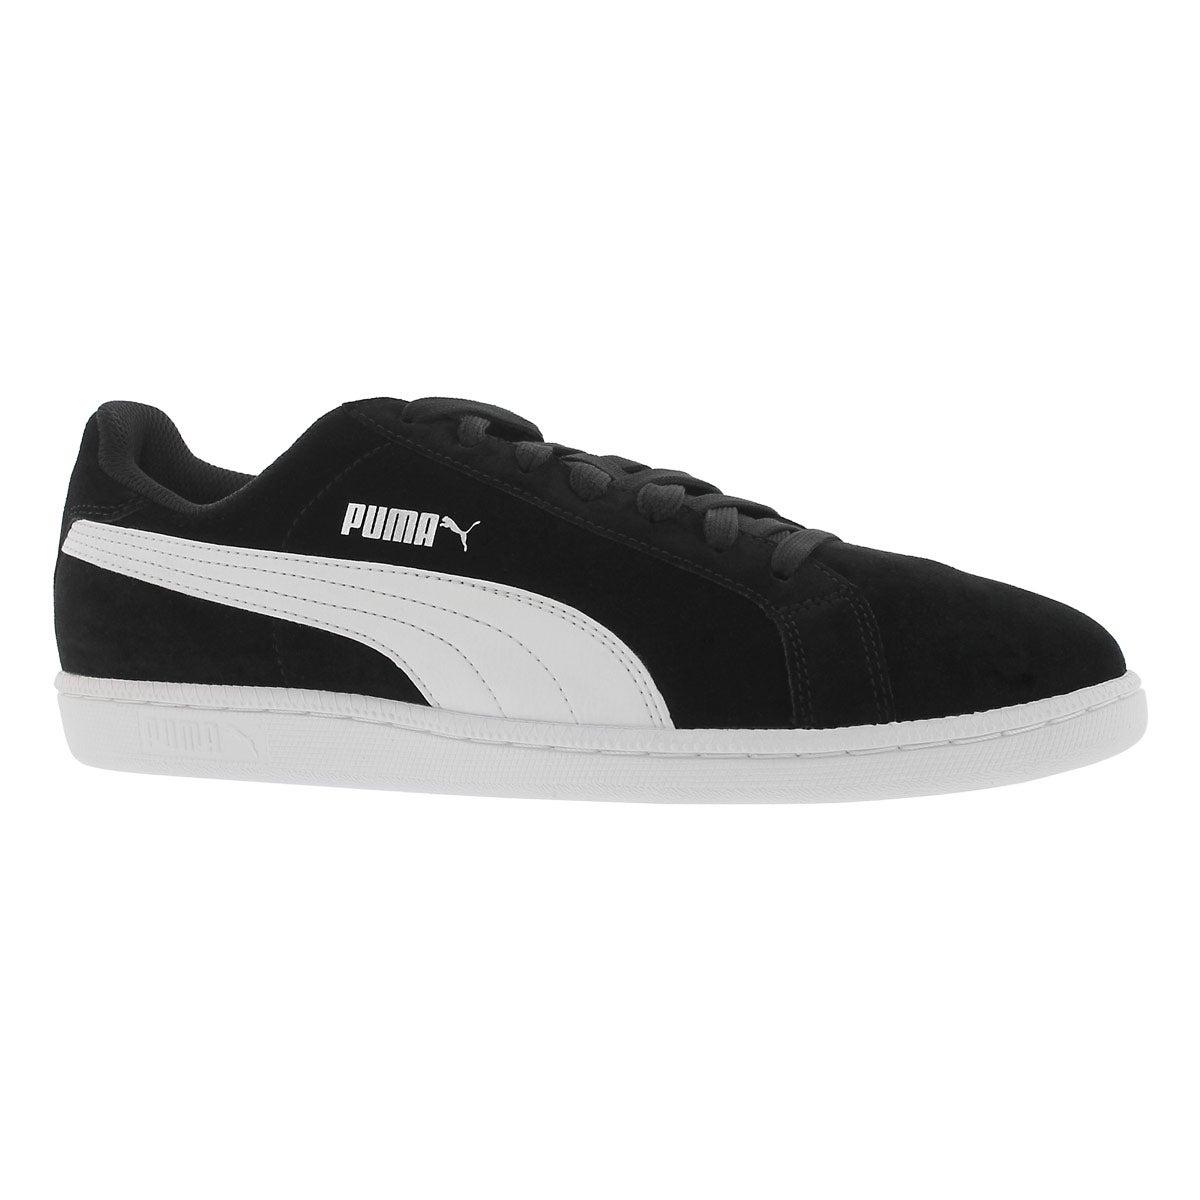 Men's PUMA SMASH black/white sneakers